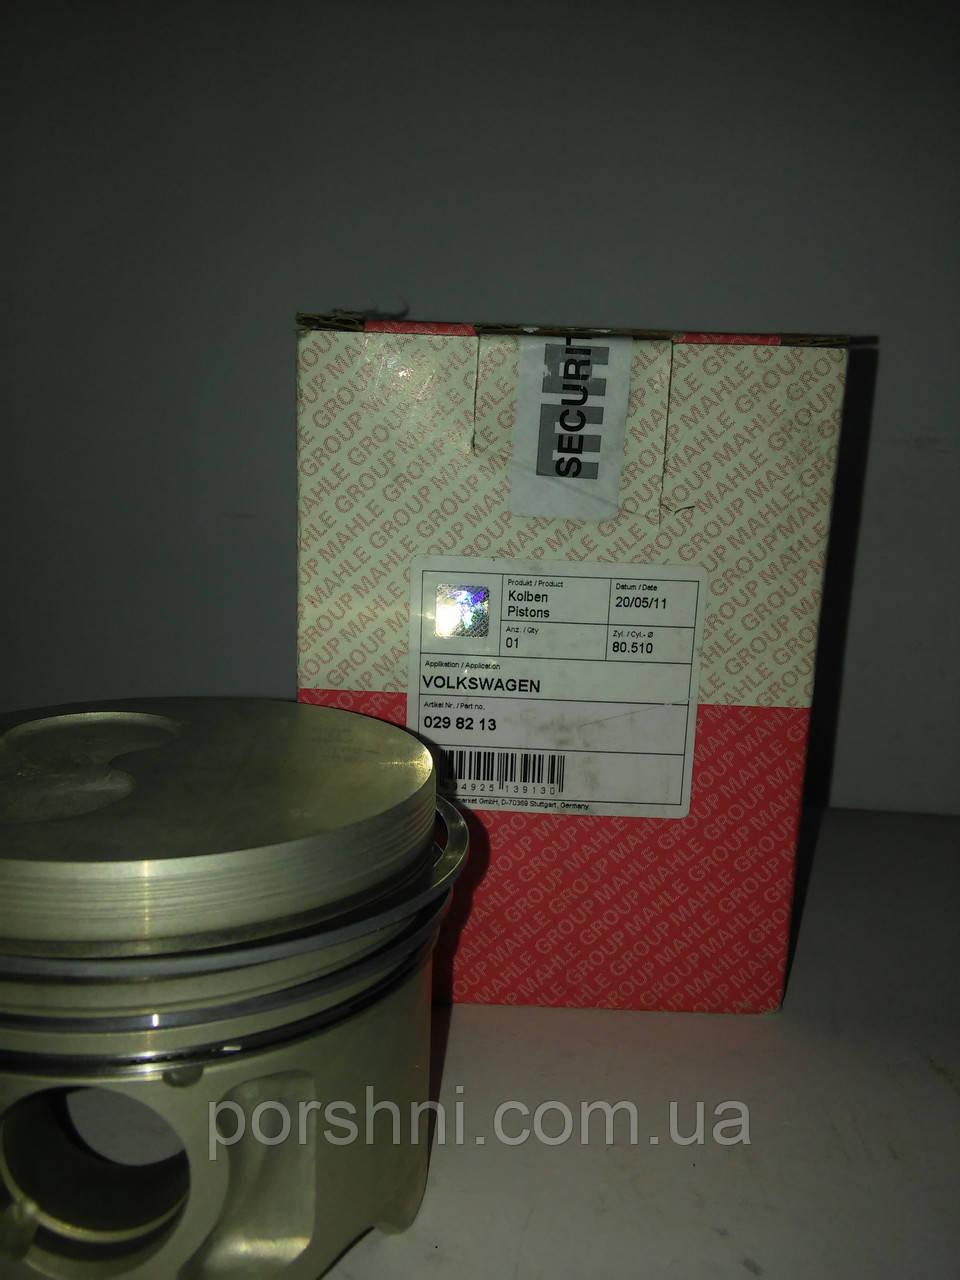 Поршни  Фольксваген Т-4 1.9 -2,4 д  ( 1.75 x 2 x 3 )  диам 80.5  MAHLE 0298213